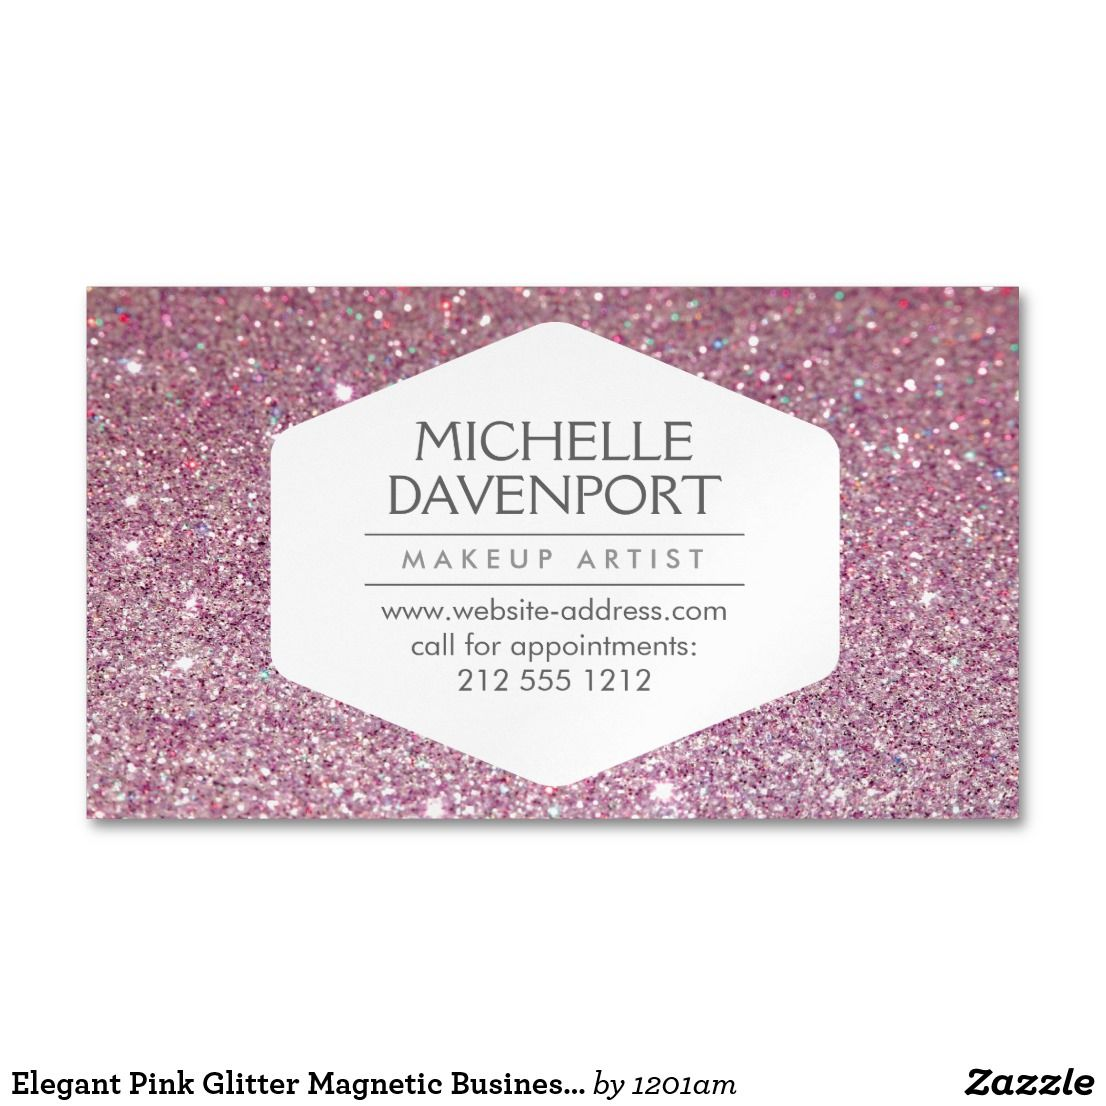 Elegant Pink Glitter Magnetic Business Card Coordinates With The ELEGANT WHITE EMBLEM ON PINK GLITTER BACKGROUND